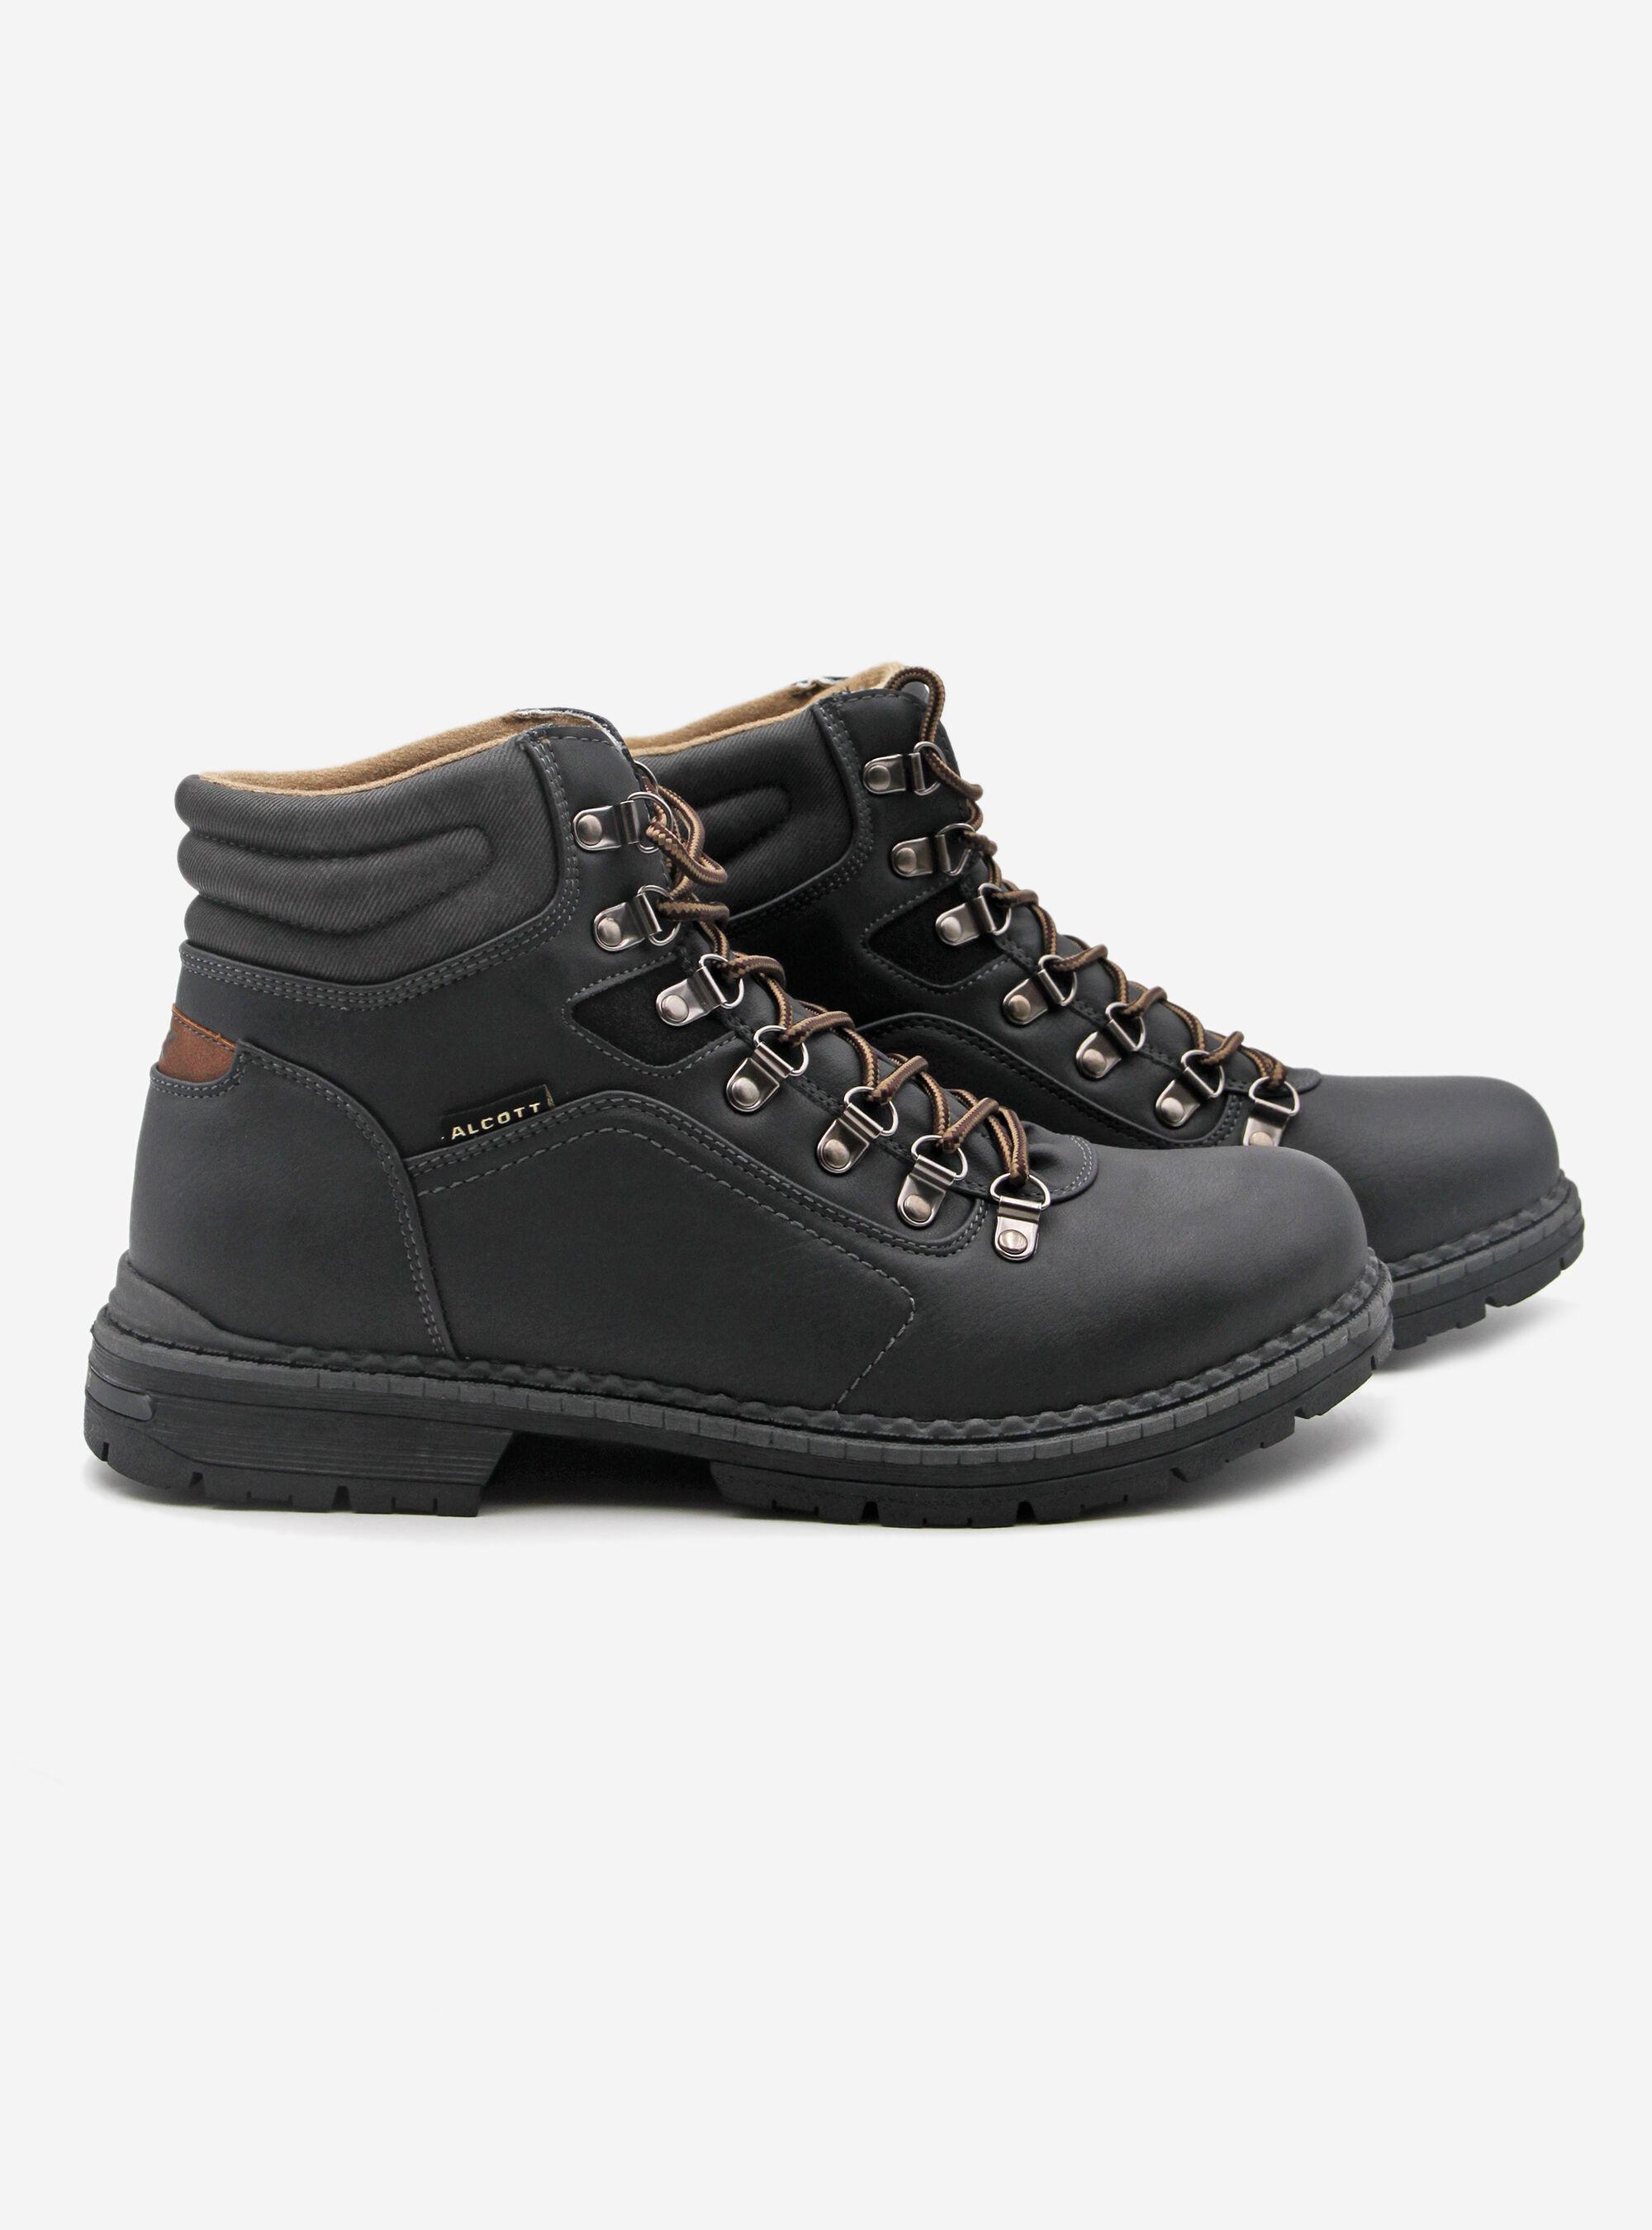 Scarpe Uomo: scarpe basse e sneakers | Alcott Alcott